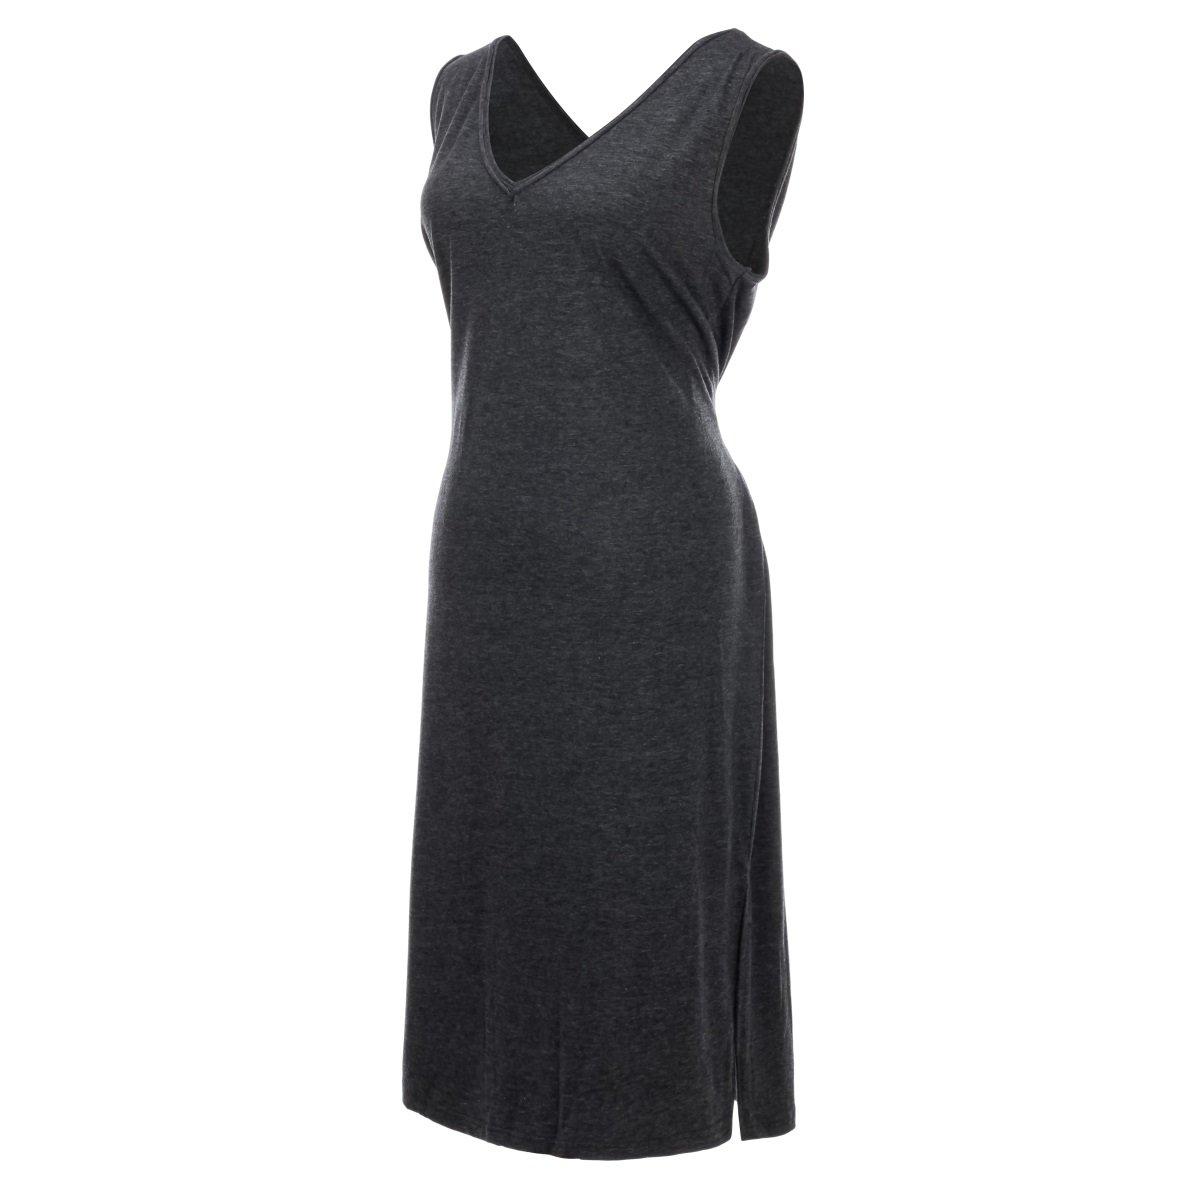 Angel Jewelry Women V-neck Simple Boho Long Maxi Dresses, Gray, One Size